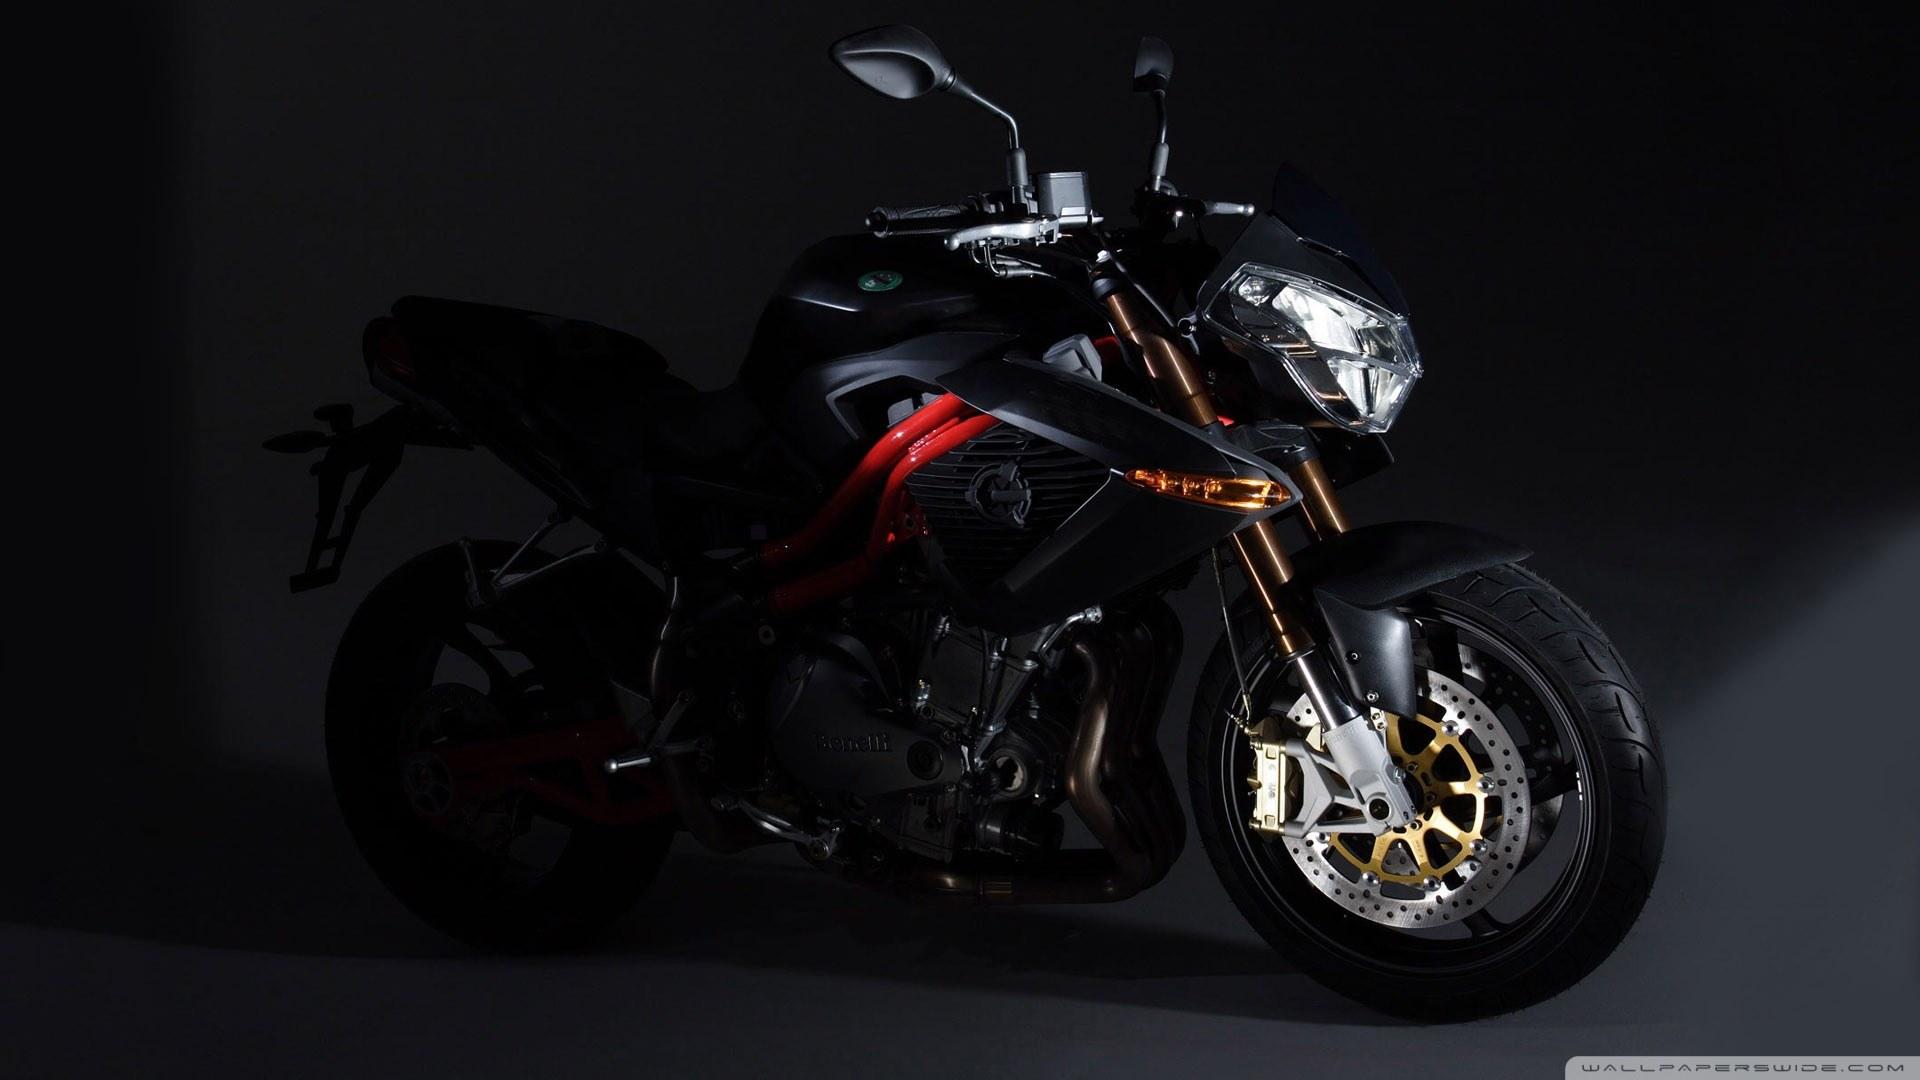 Harley Davidson Wallpaper Hd 248470 1920x1080